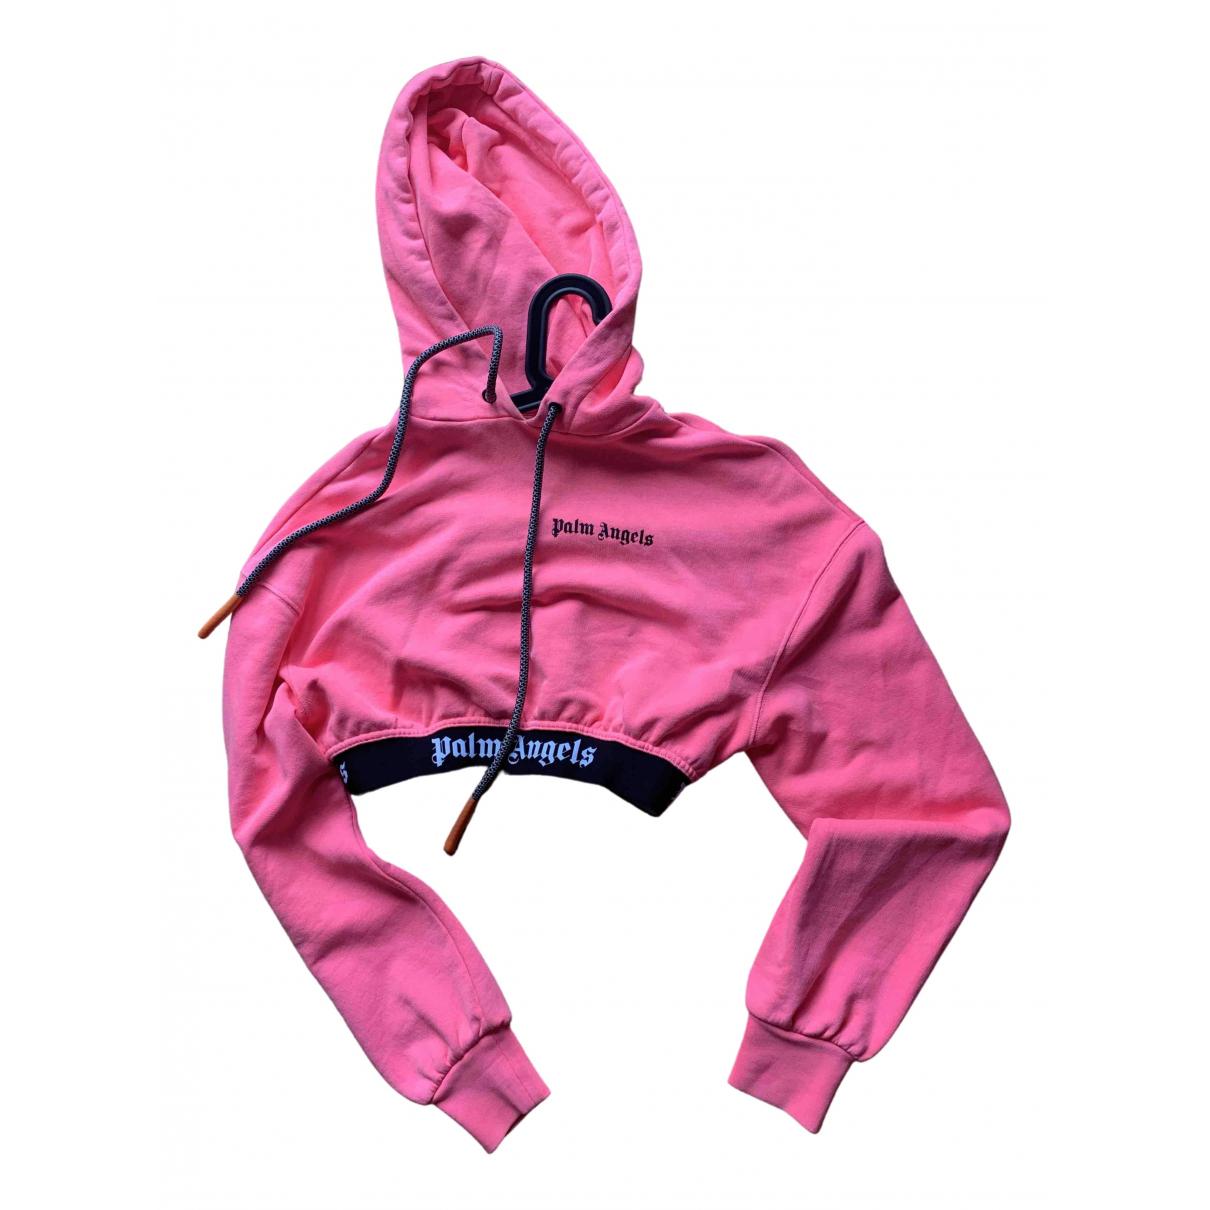 Palm Angels N Pink Cotton Knitwear for Women S International